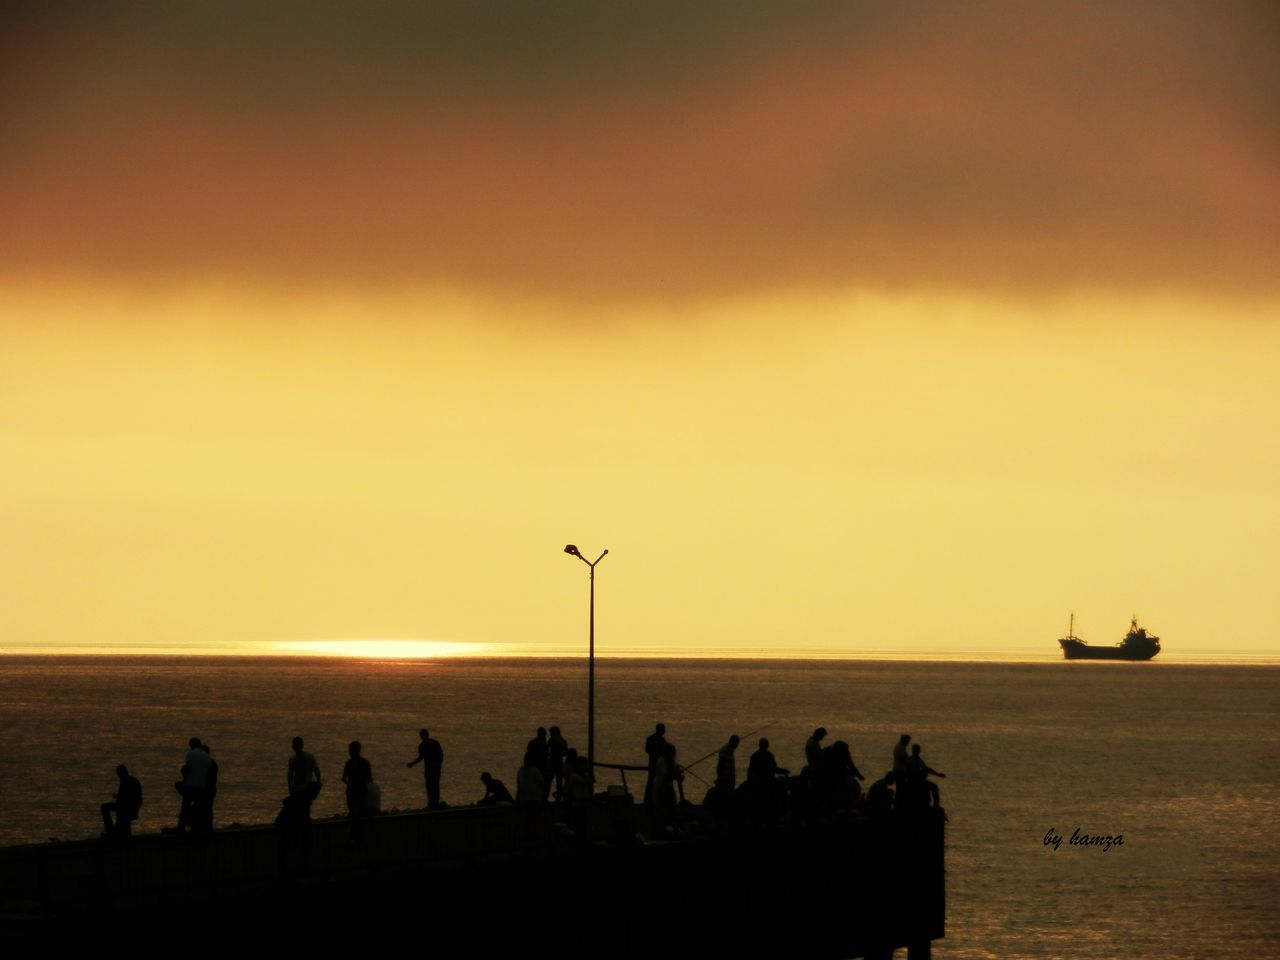 Hello World Taking Photos Photography Pictureoftheday Akşam Güneşi Hayatsokaklarda Black Sea♥ Pier People Watching Fishing Time